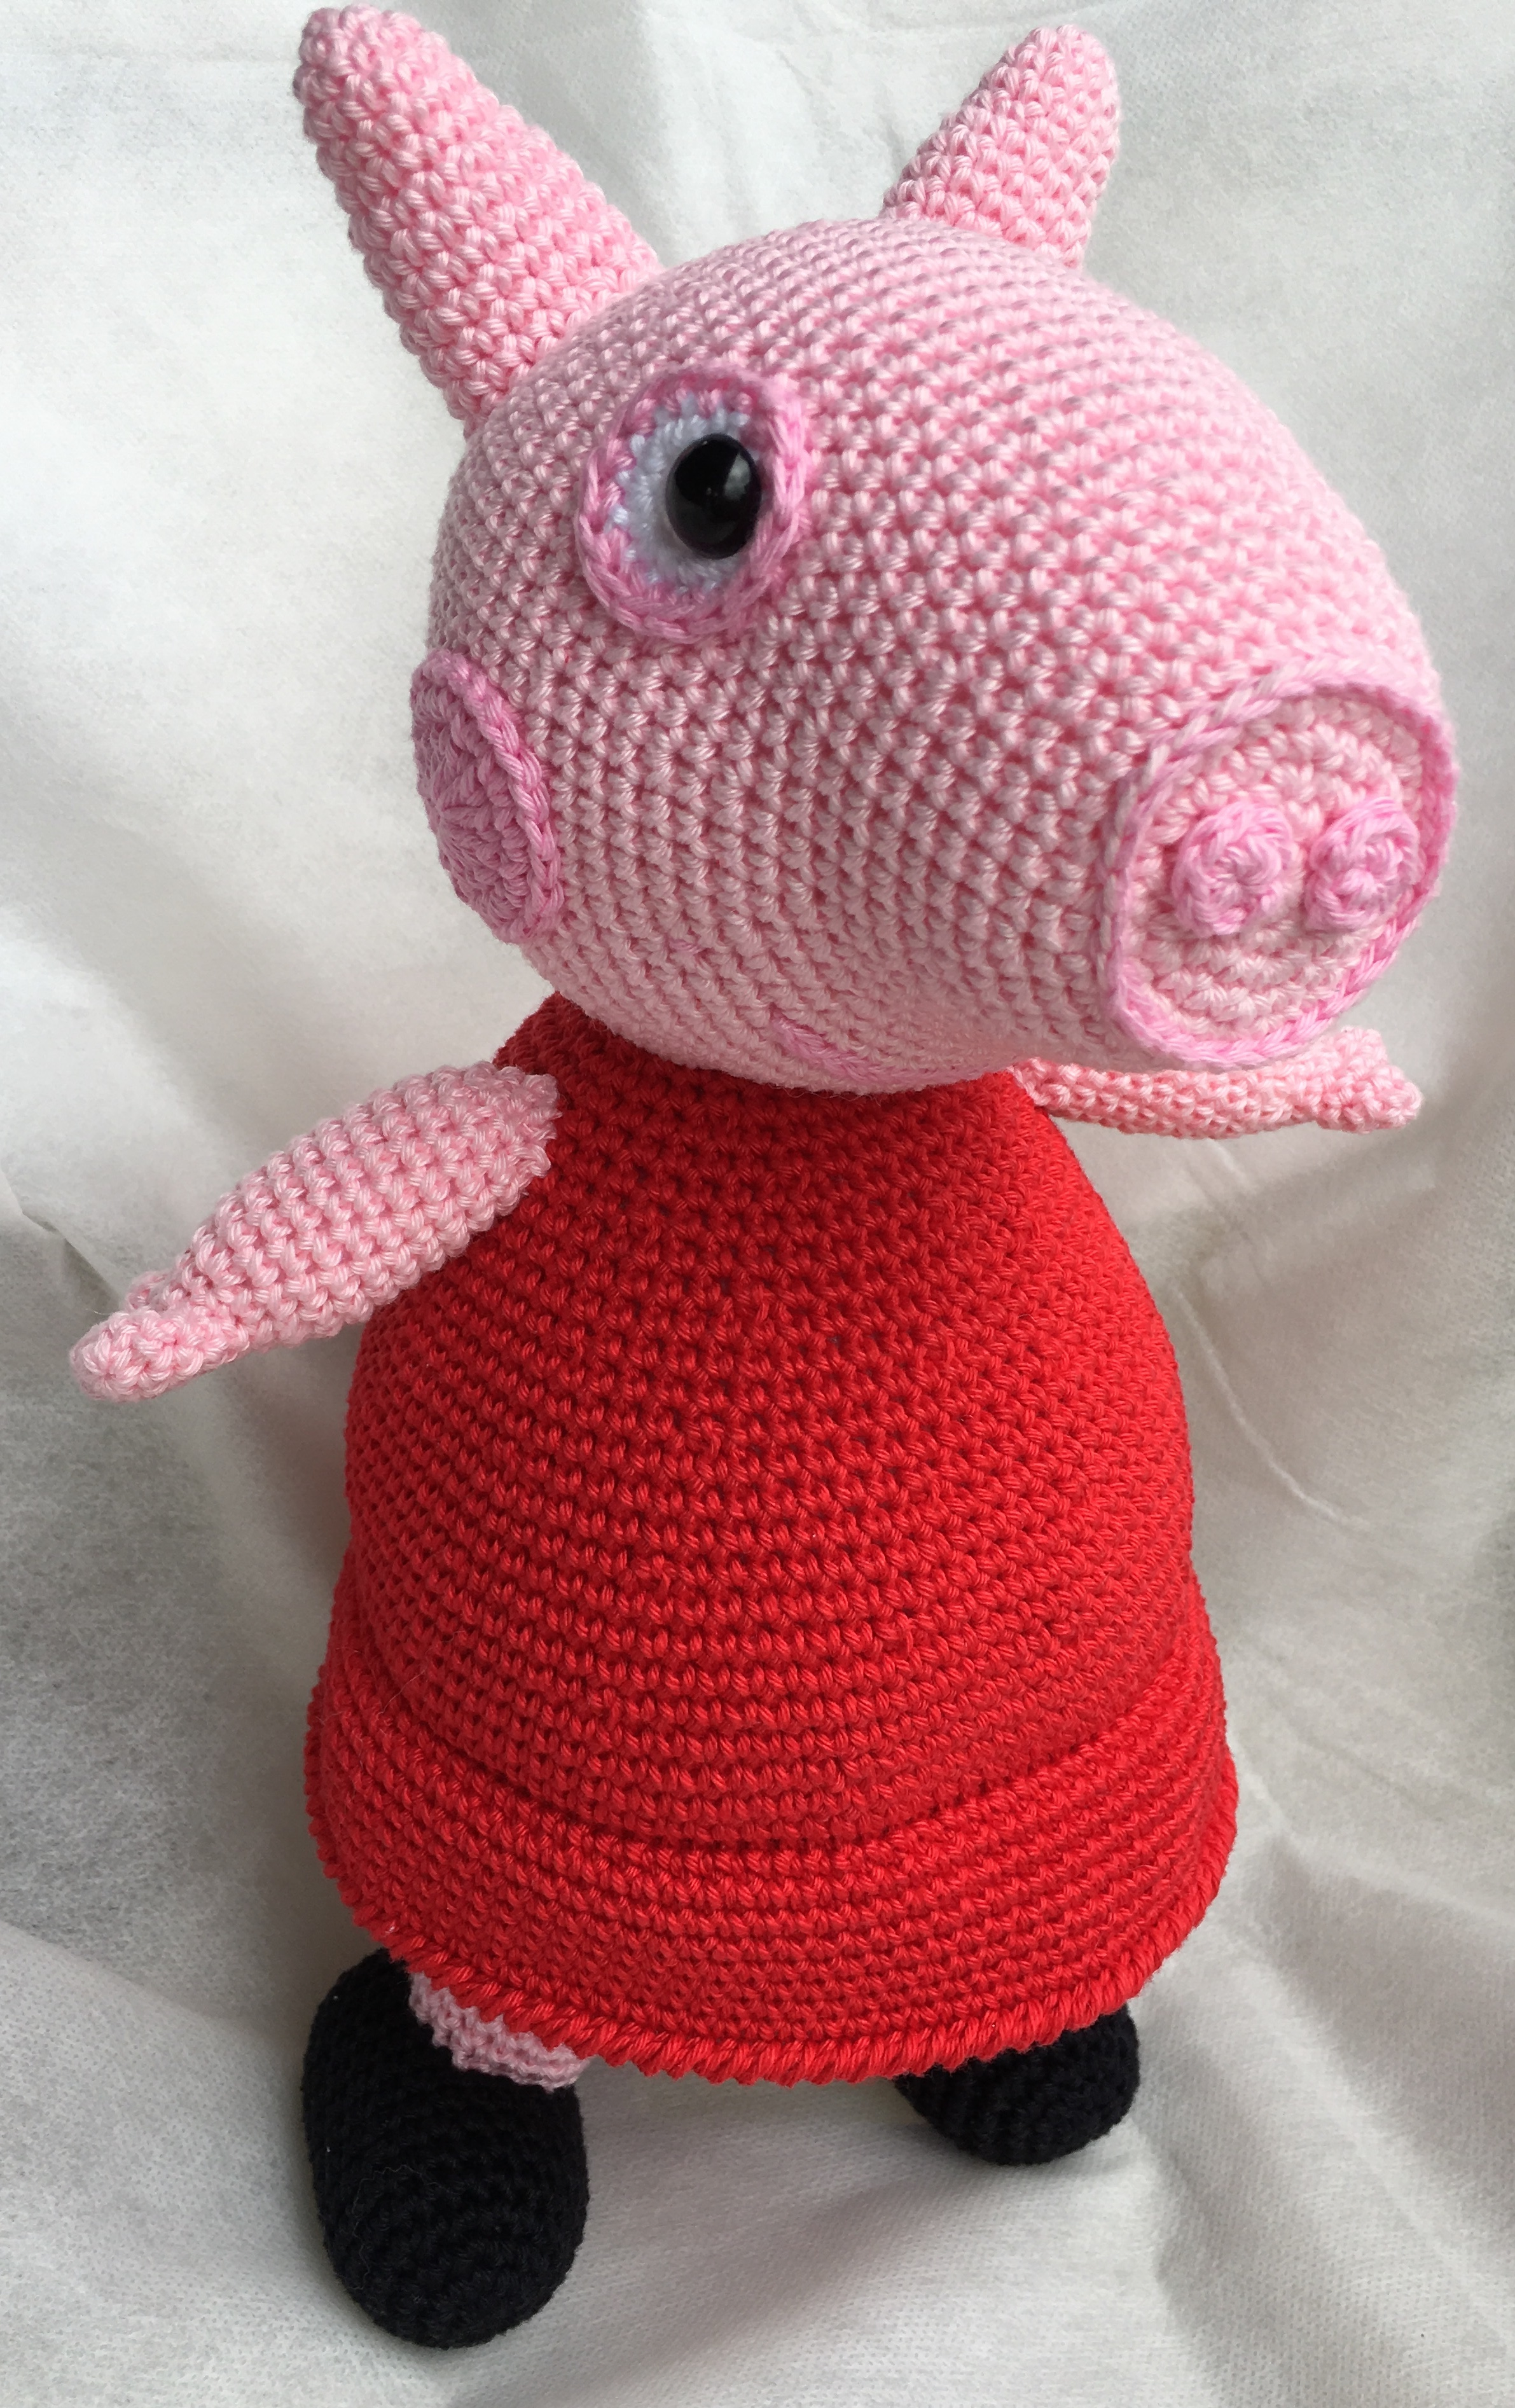 Peppa Pig - free crochet pattern - Amigurumi Today | 3786x2382